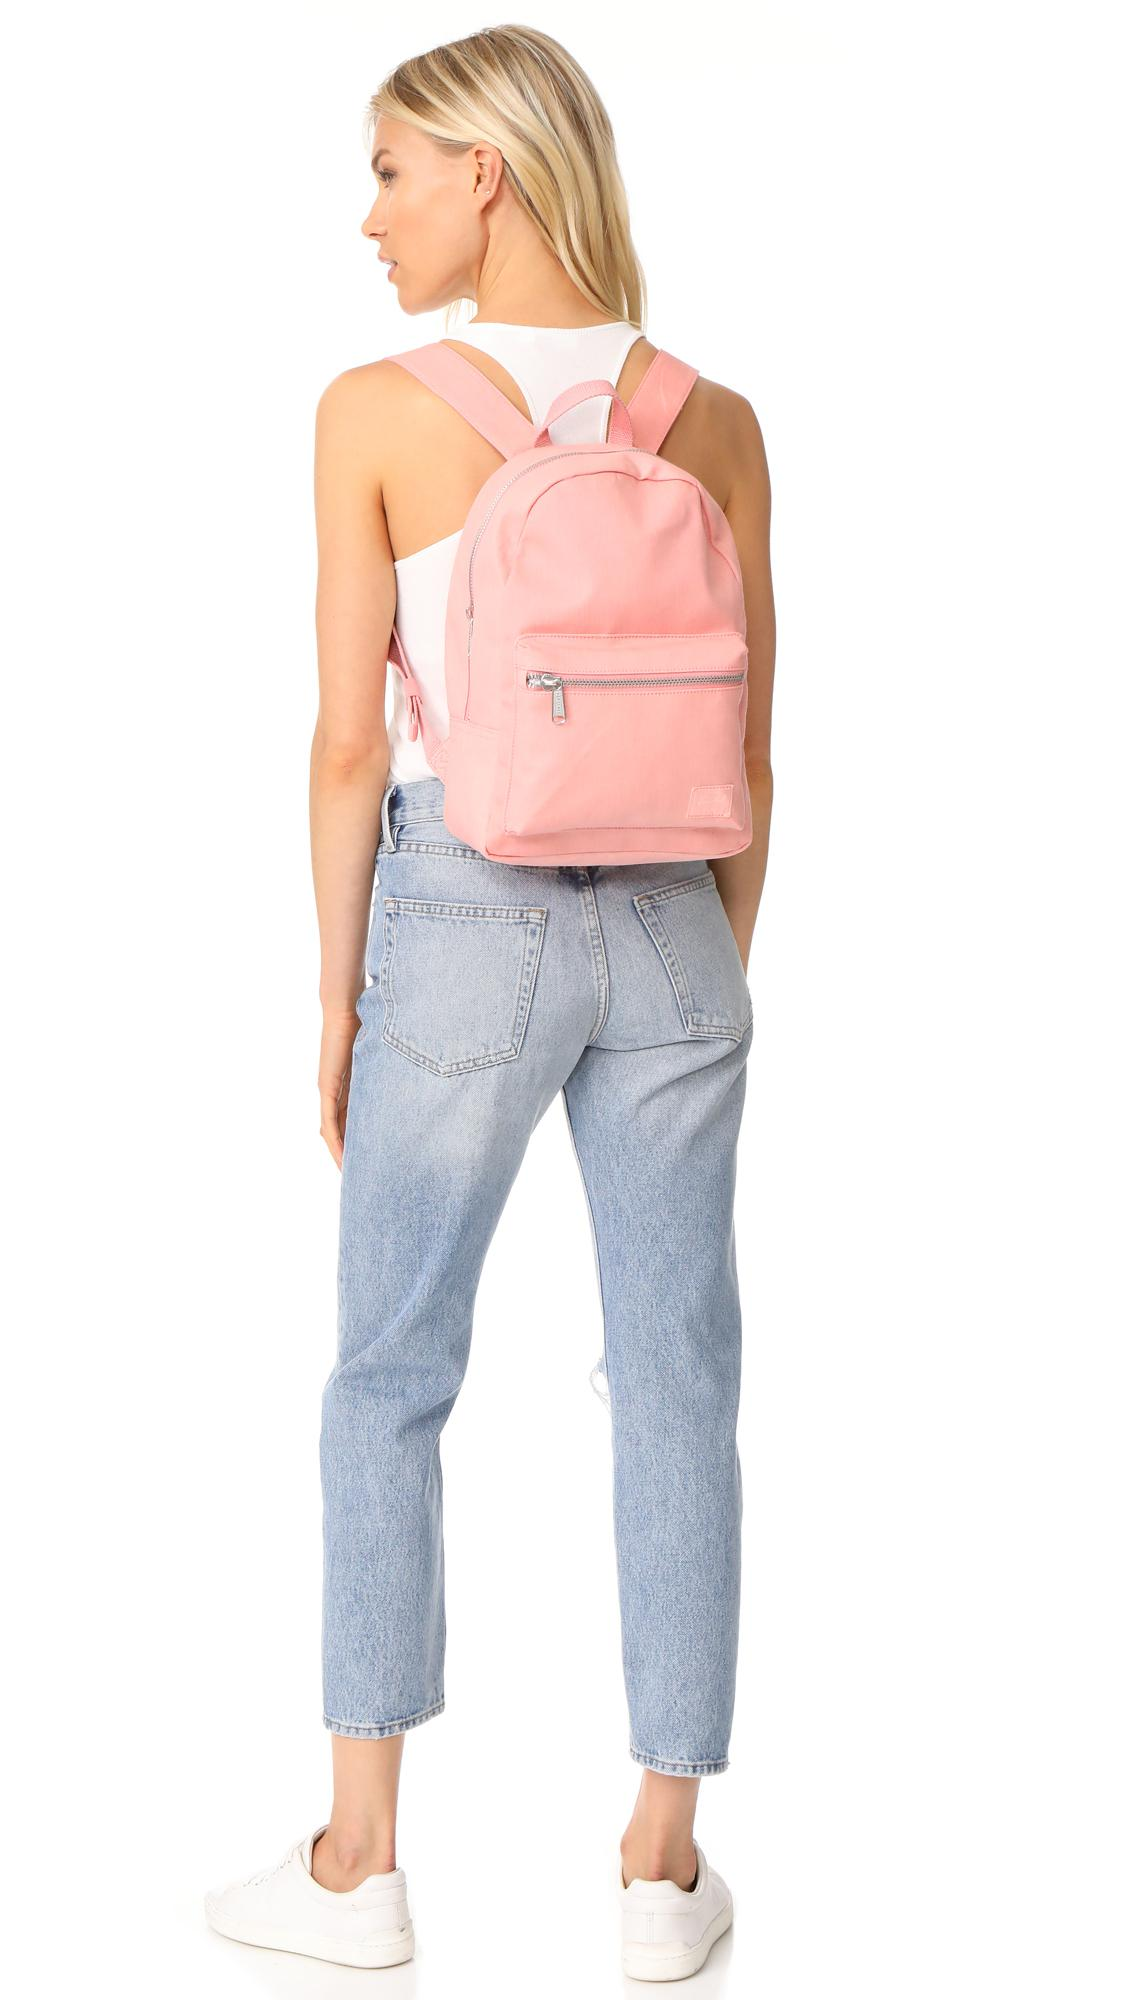 e1c90a5f75b Lyst - Herschel Supply Co. Grove X-small Backpack